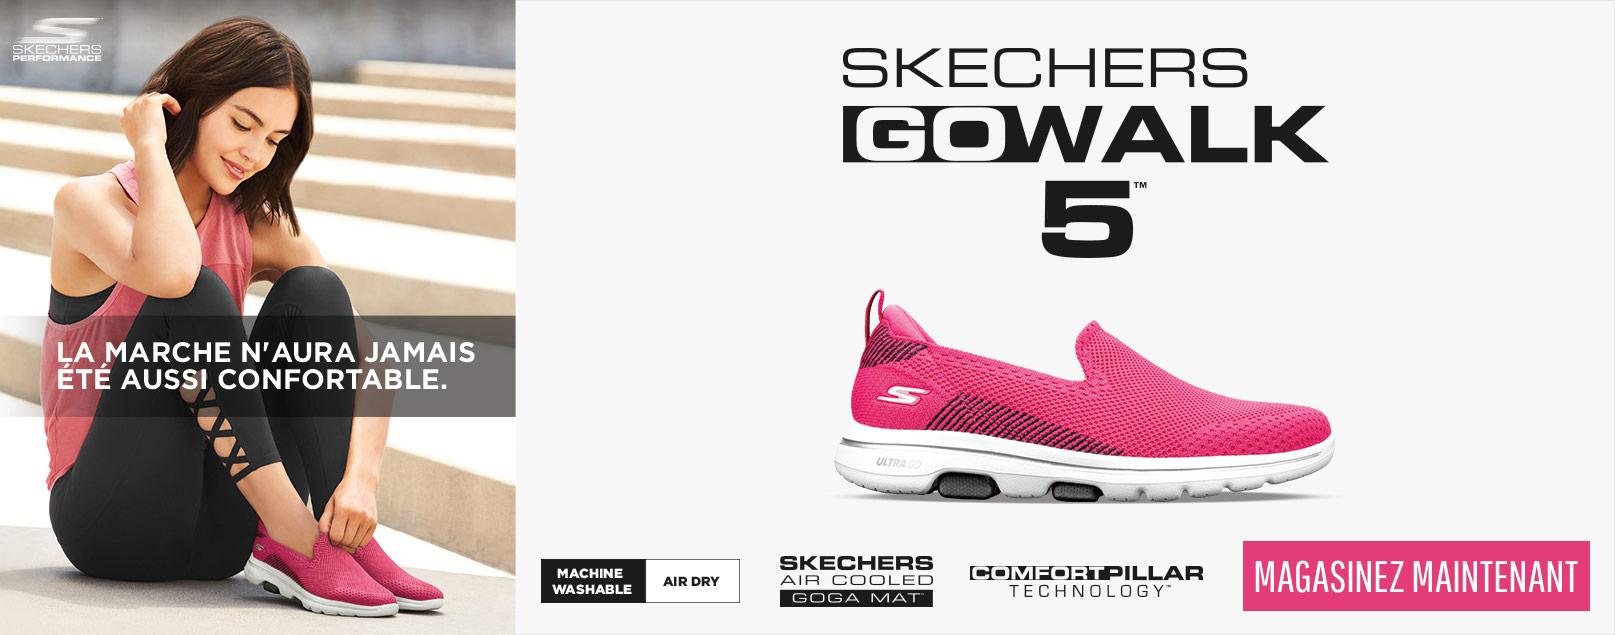 skechers go walk 5 femme